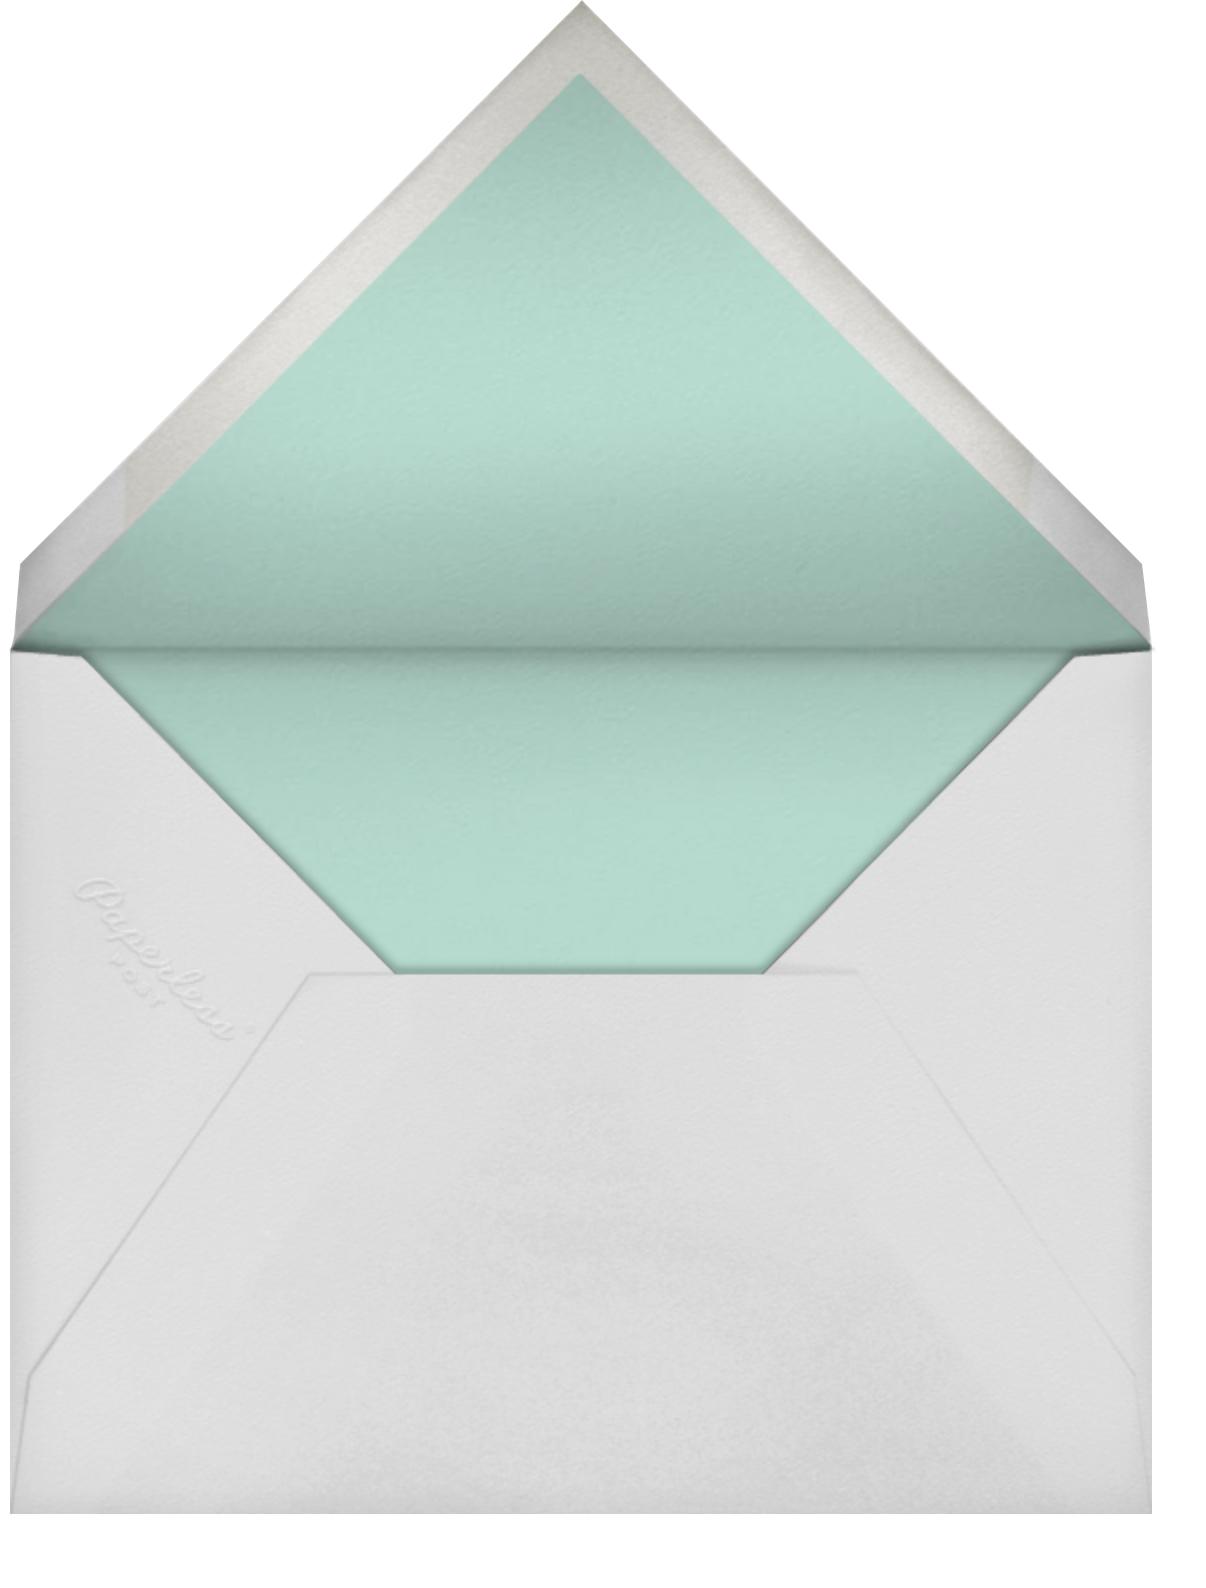 Photo Flourish - New Date - Paperless Post - Envelope